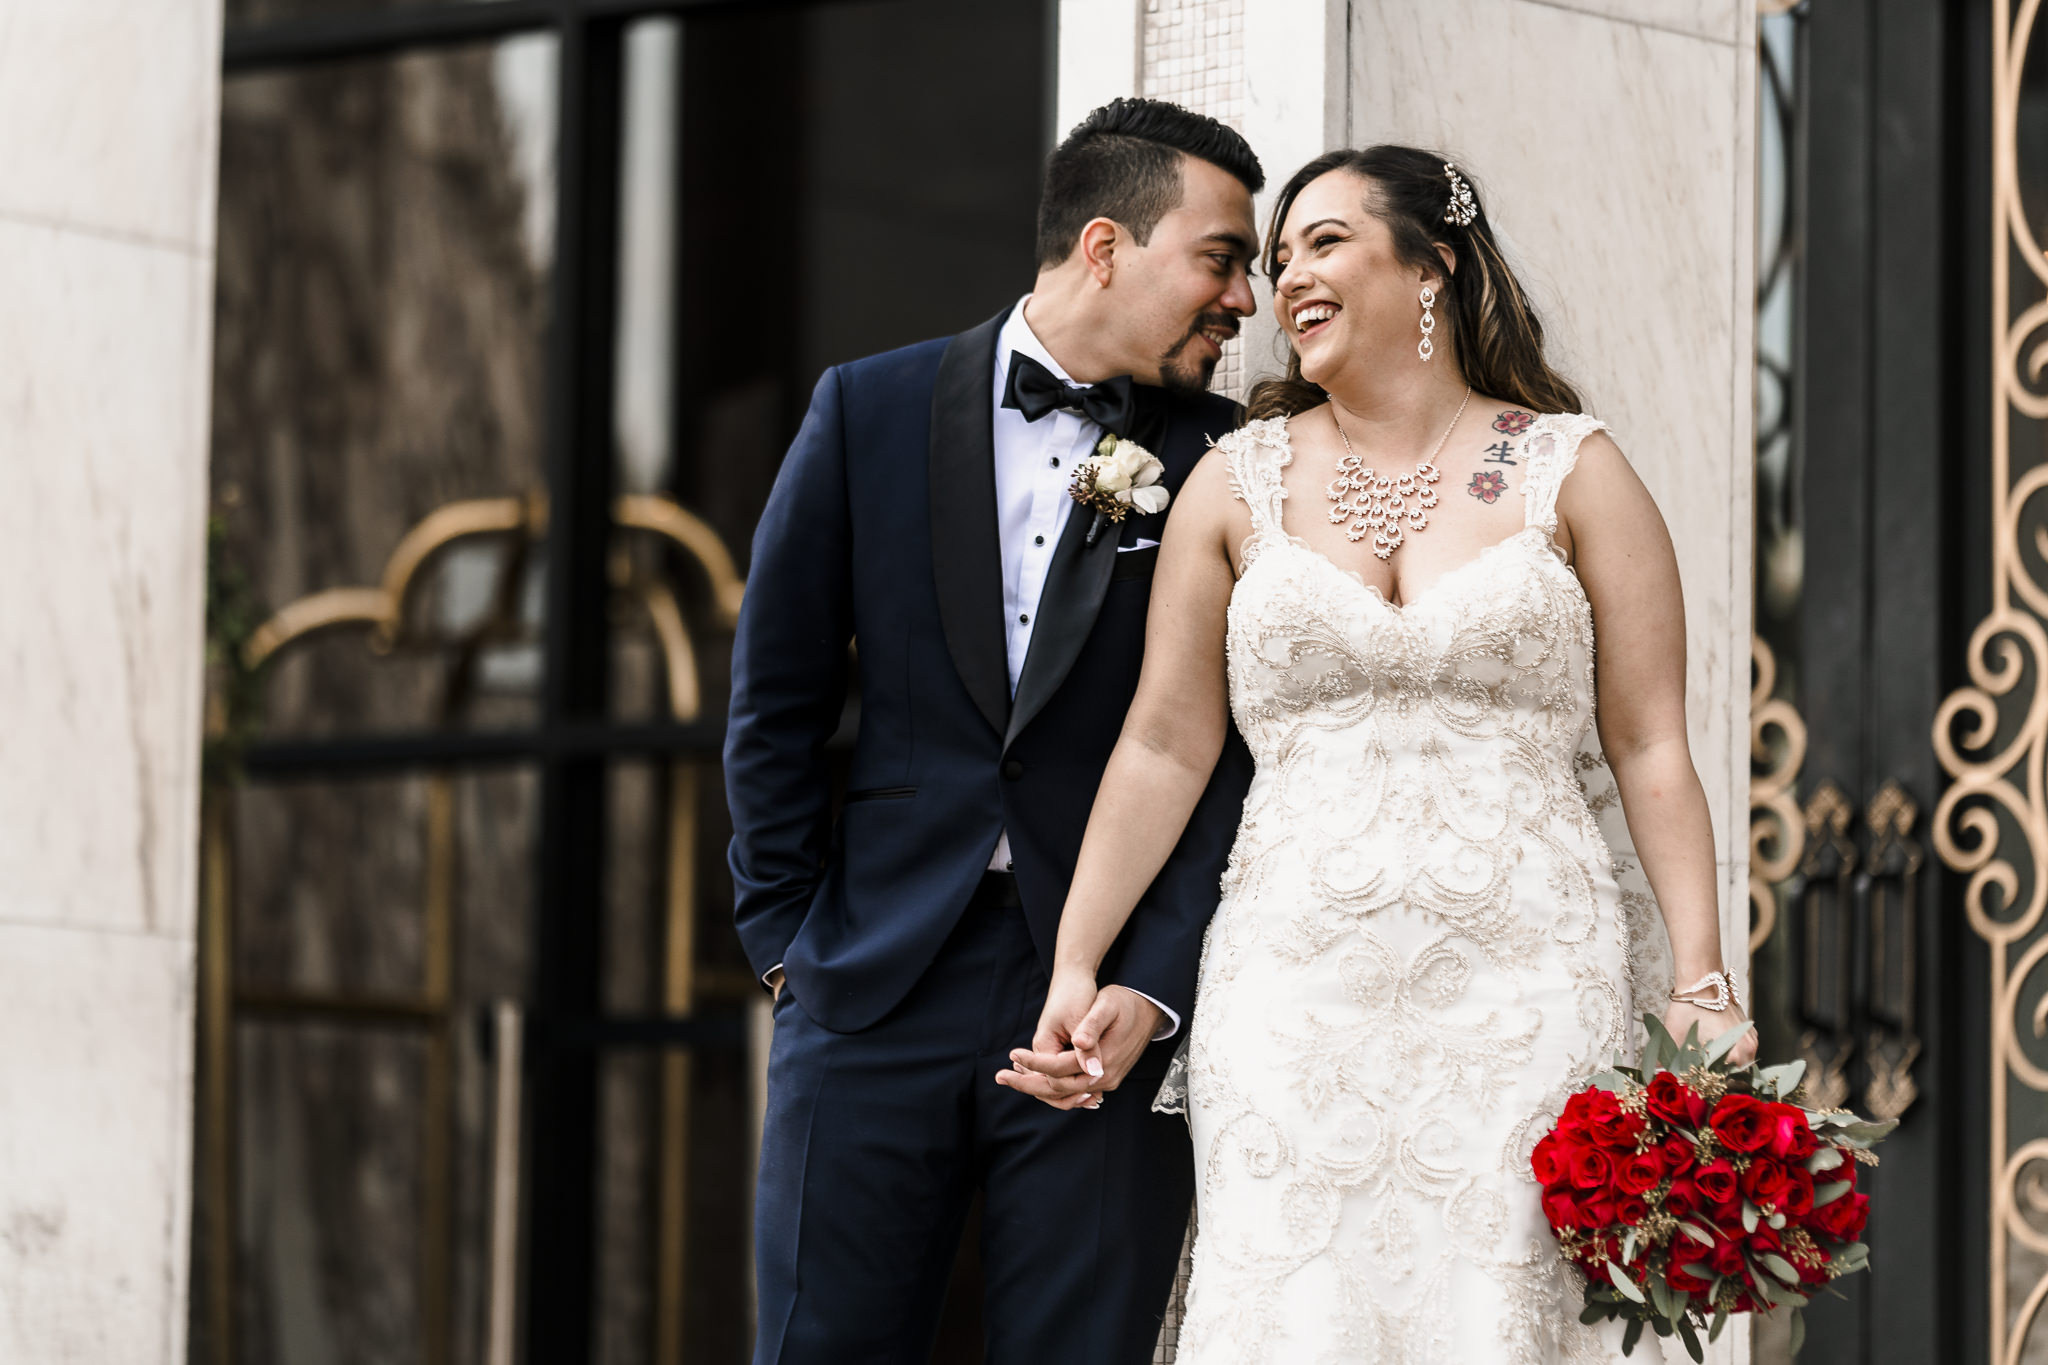 Sanchez-Leonards-Palazzo-New-York-Wedding-Photographer-31.JPG